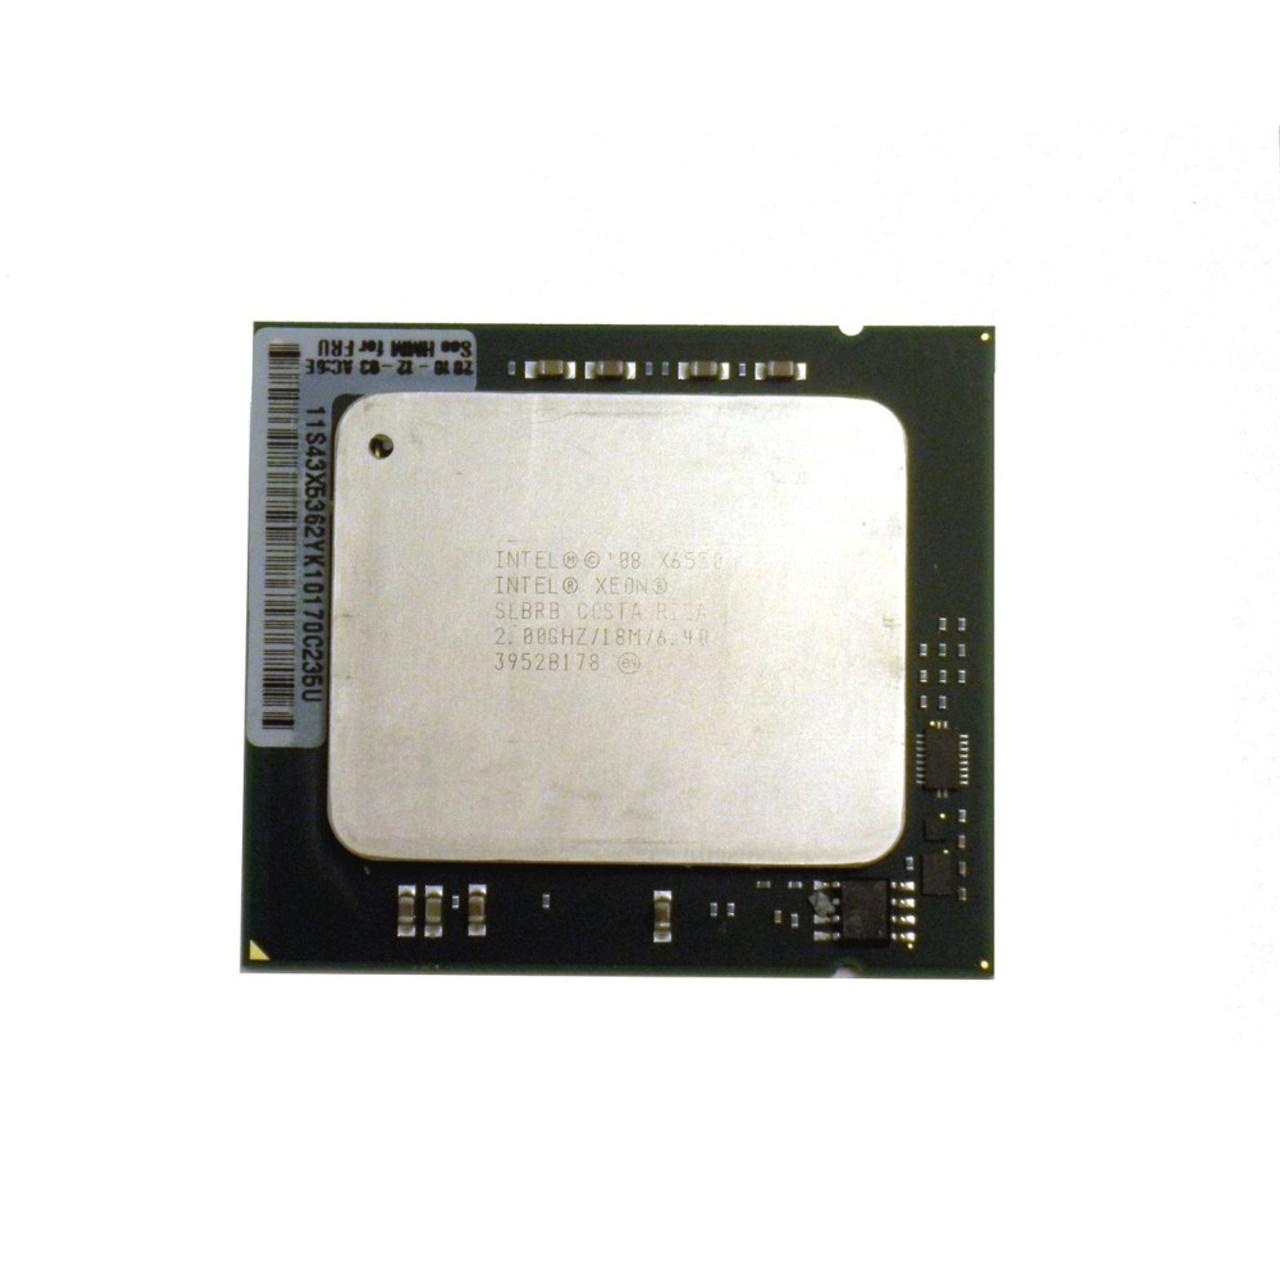 Socket LGA-1567 IBM Xeon E7-4820 2 GHz Processor Upgrade